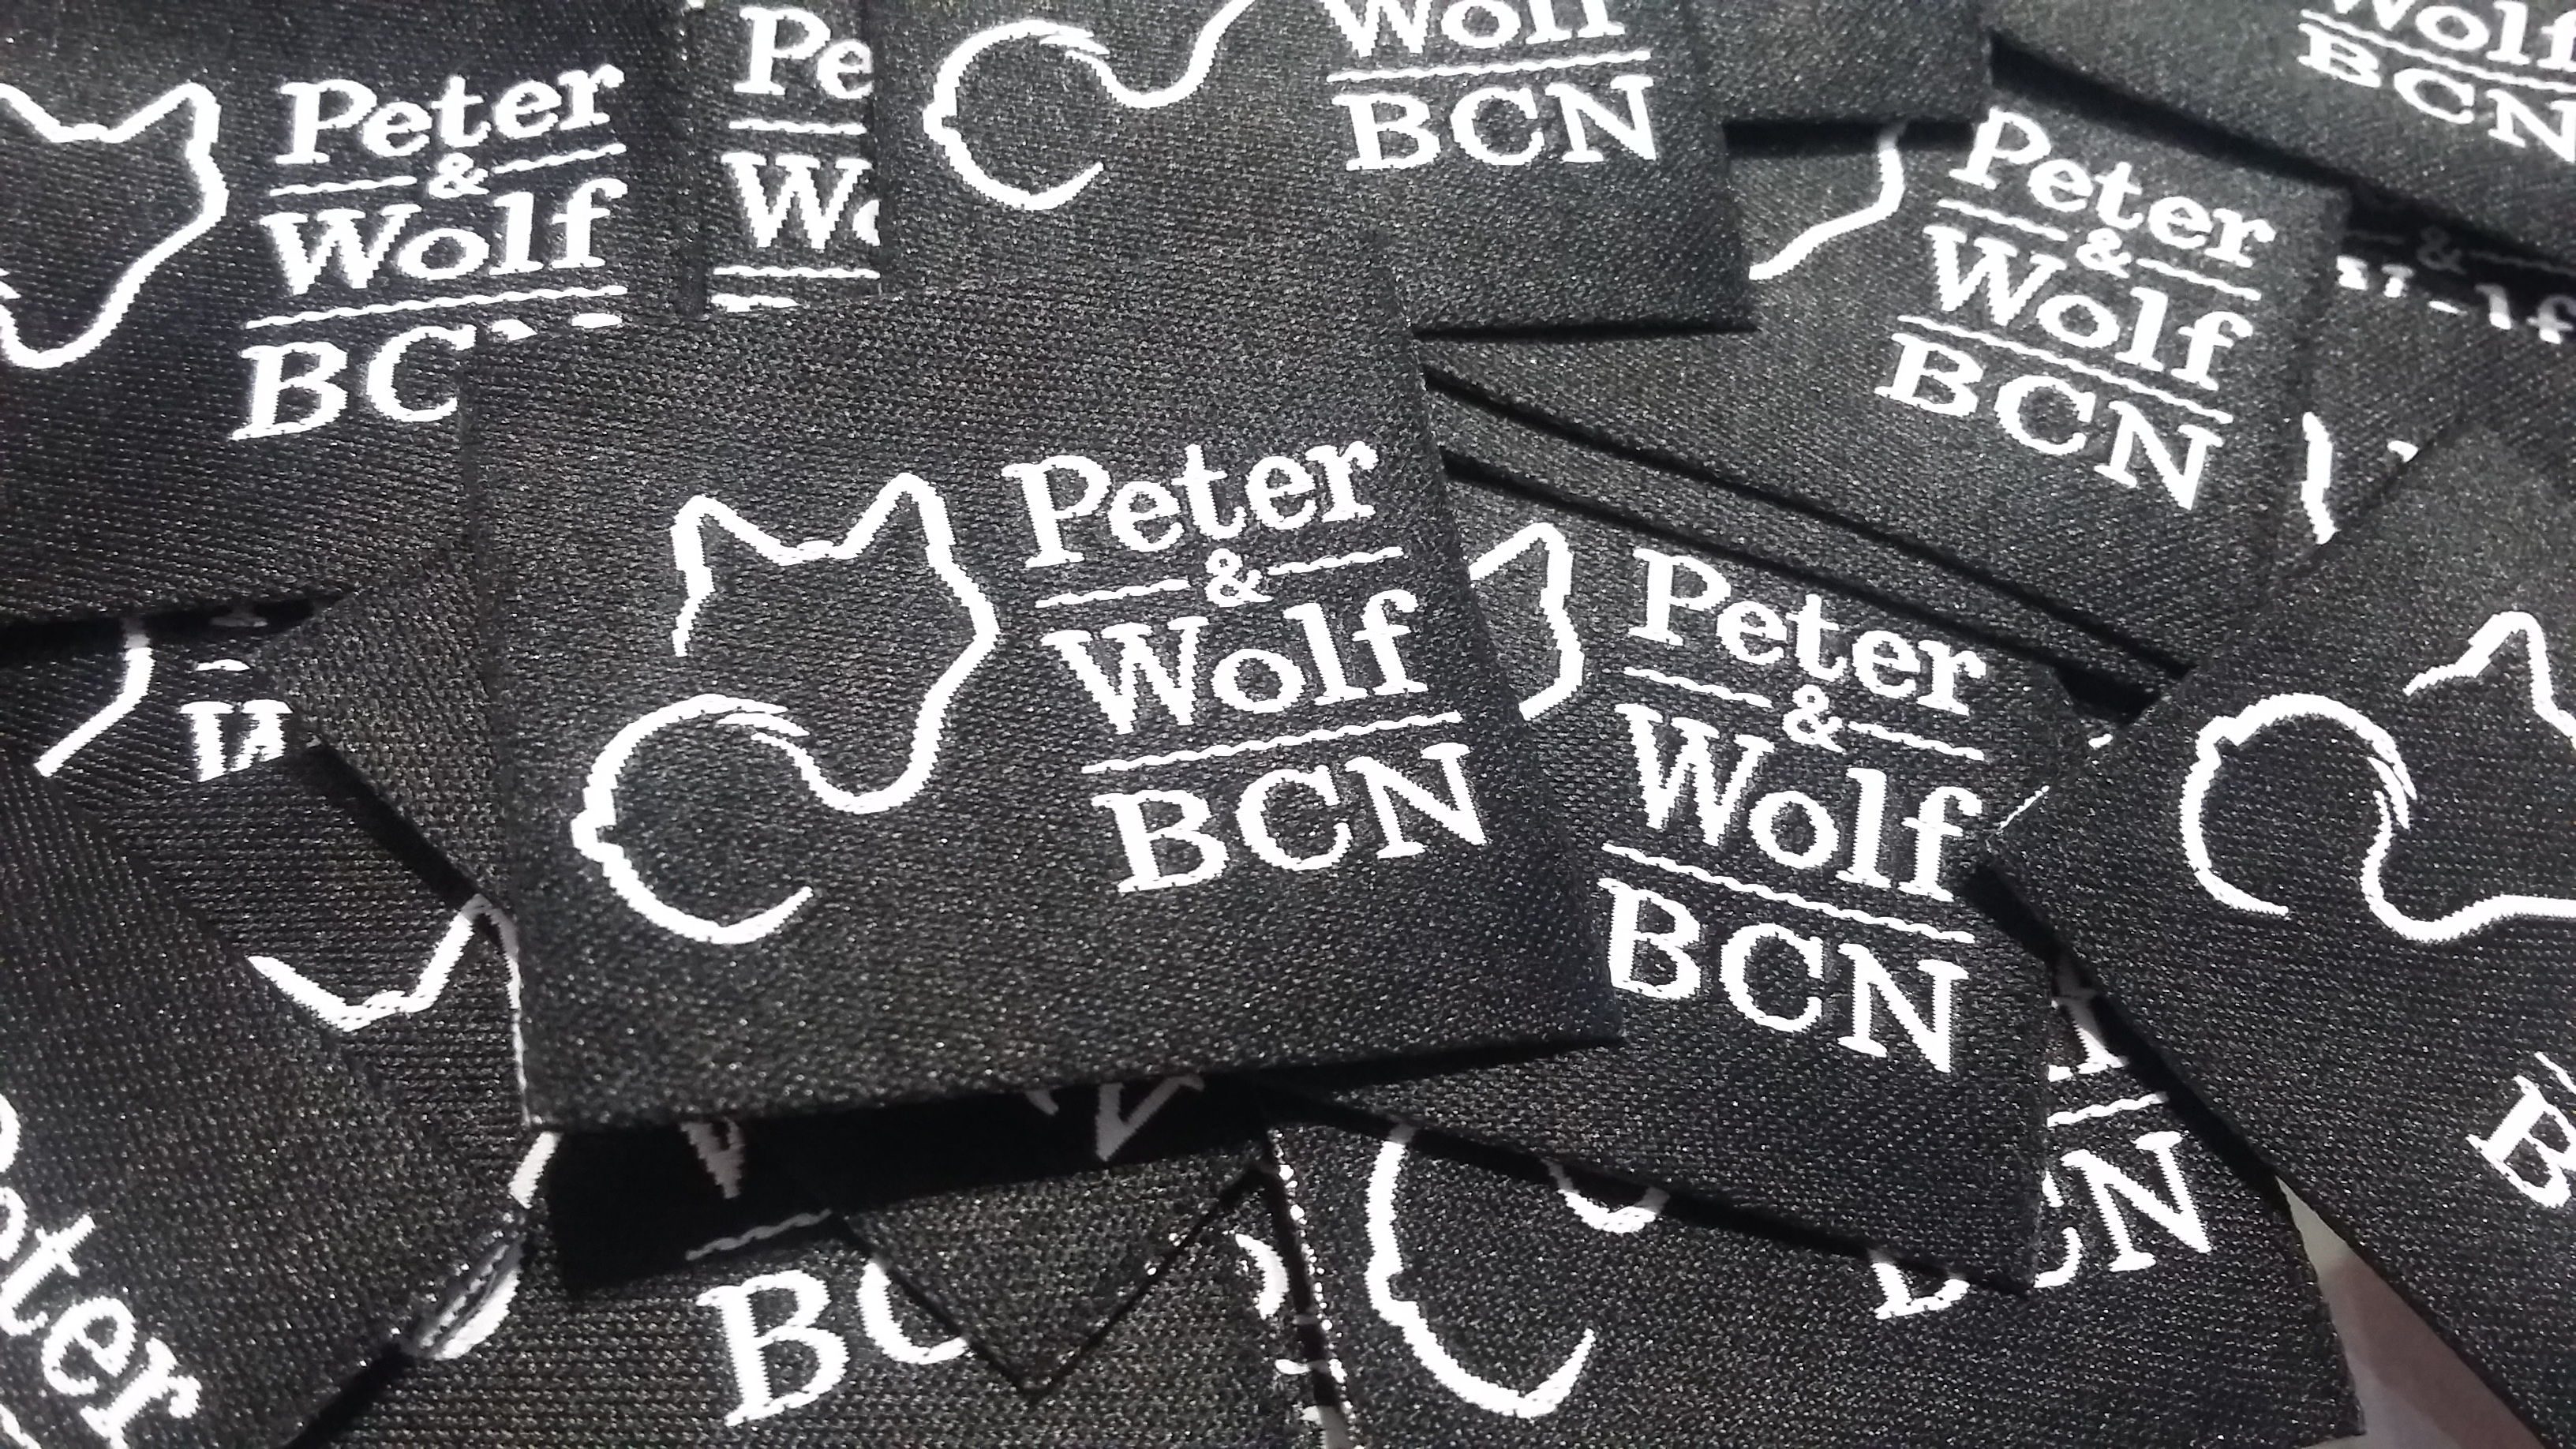 Etiquetas Peter & Wolf BCN